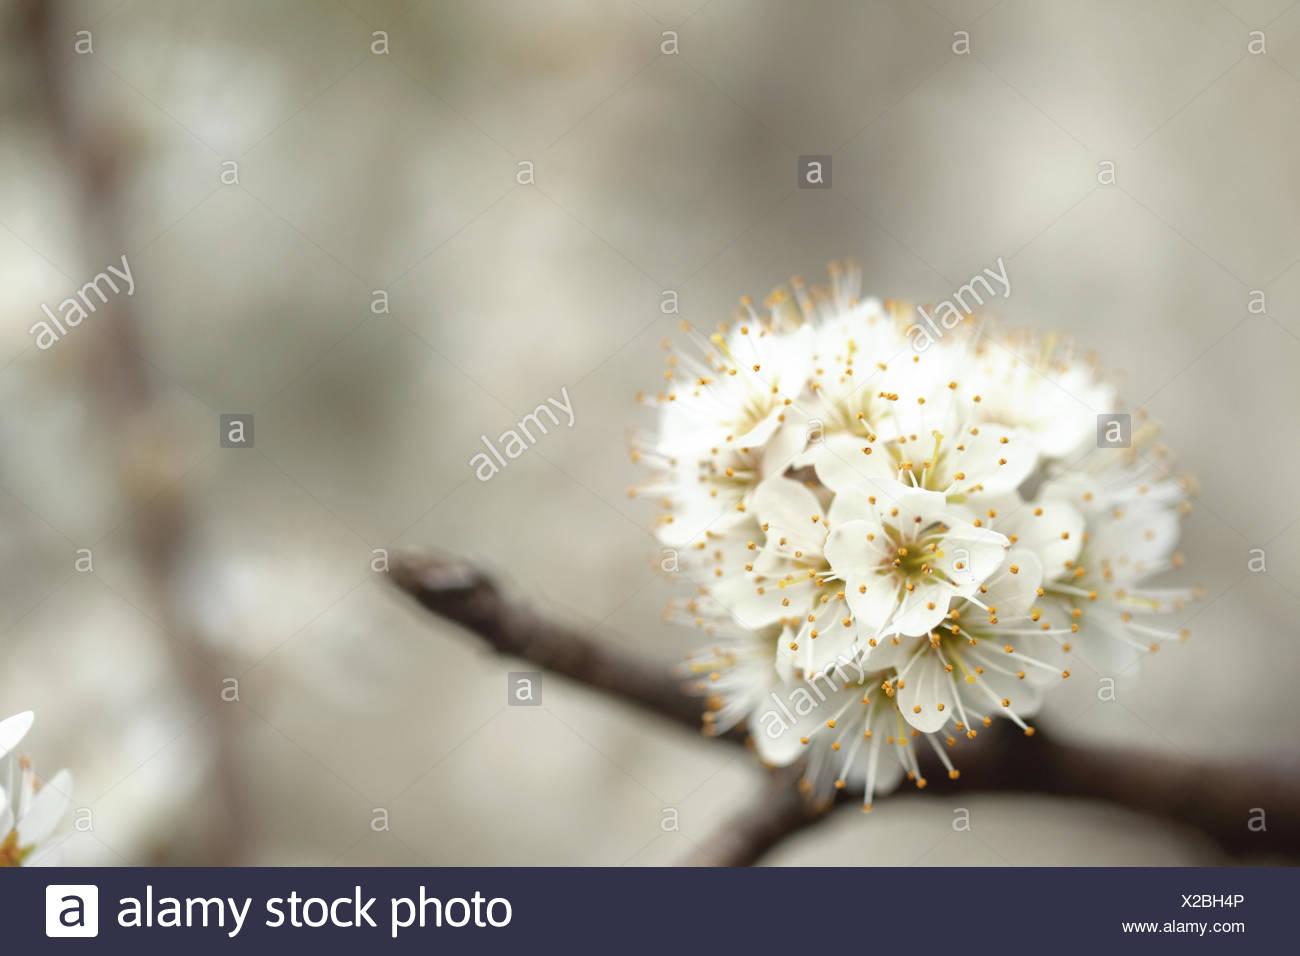 Blackthorn, Prunus spinosa, develops flowers before leaf development. - Stock Image